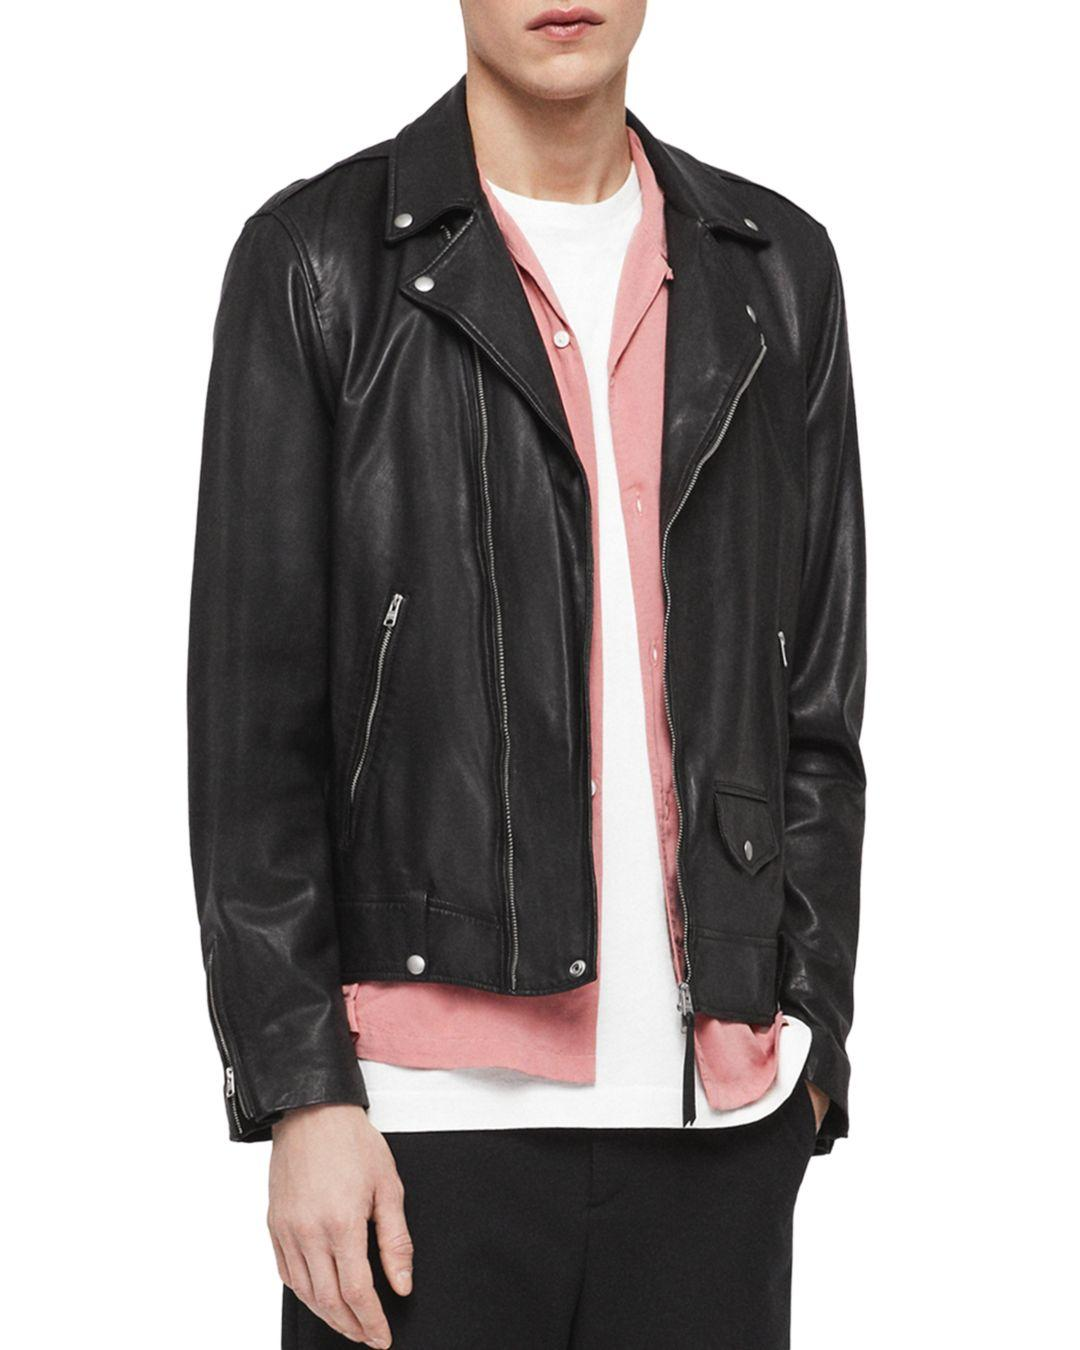 fb0df404cab AllSaints Ace Leather Biker Jacket in Black for Men - Lyst